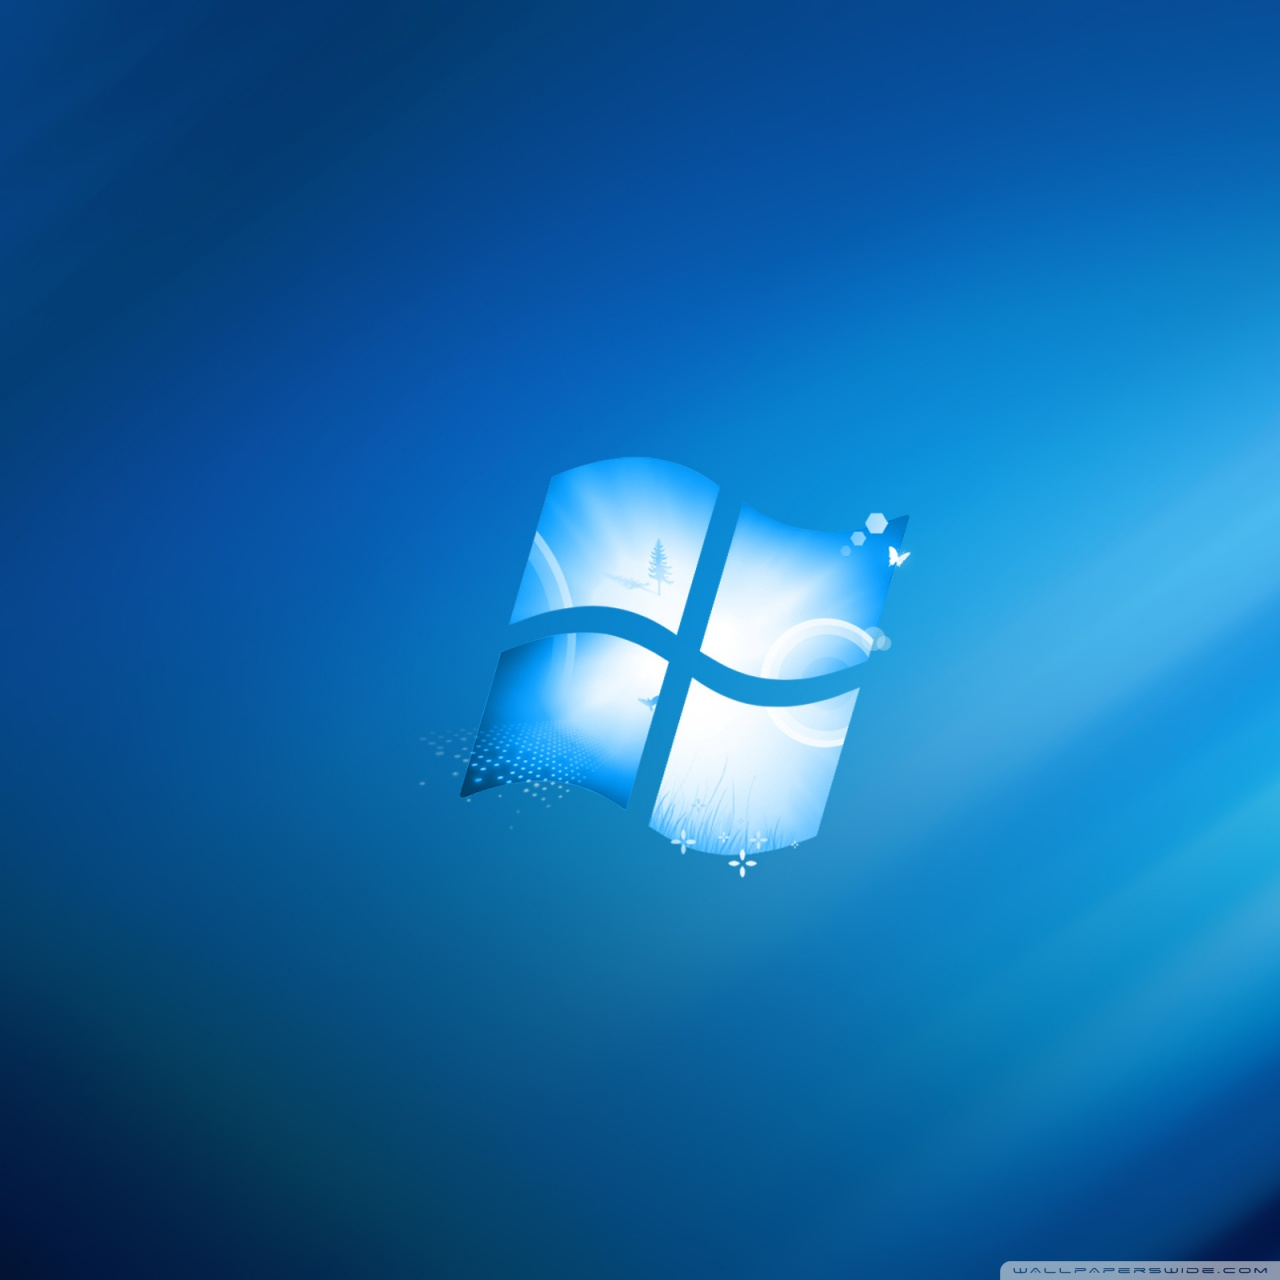 windows 8 background i ❤ uhd desktop wallpaper for ultra hd 4k 8k